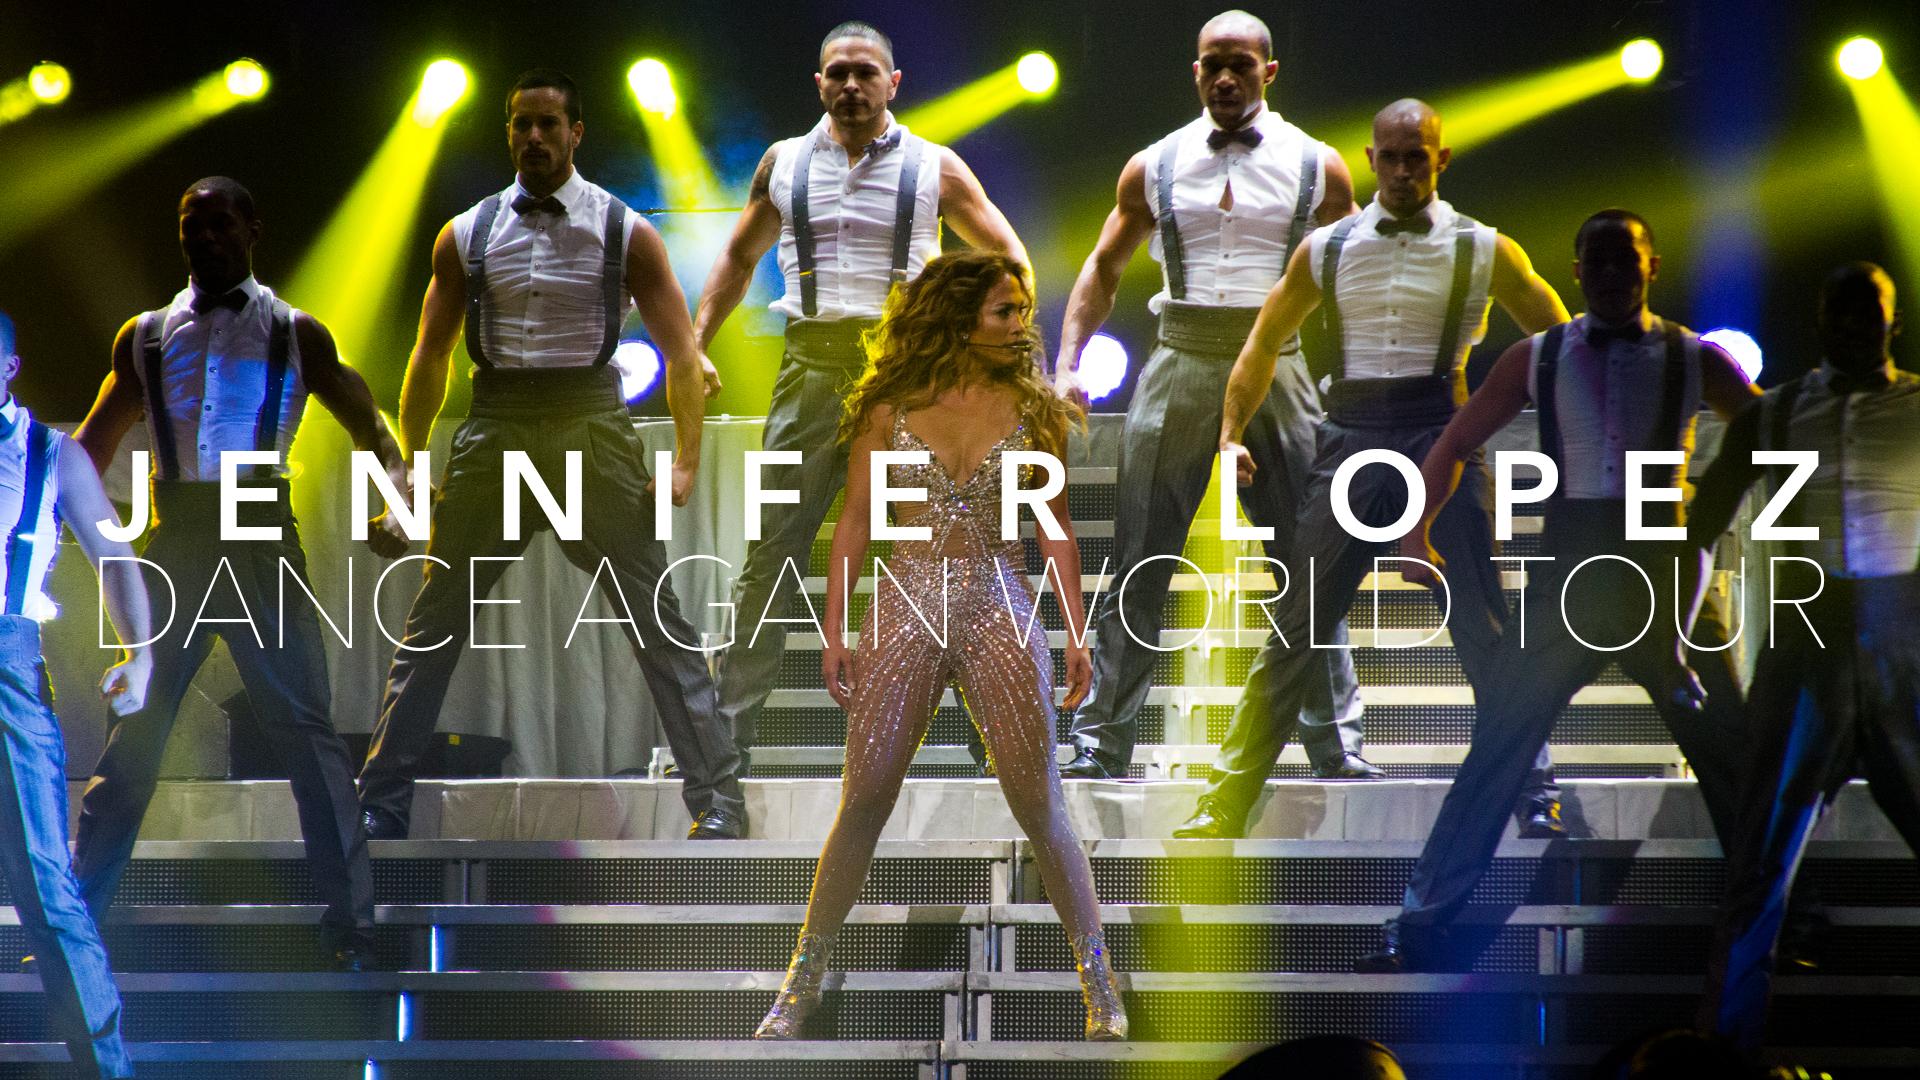 JENNIFER LOPEZ DANCE AGAIN WORLD TOUR AMERICAN AIRLINES ARENA MIAMI (JLO SHOW 2)